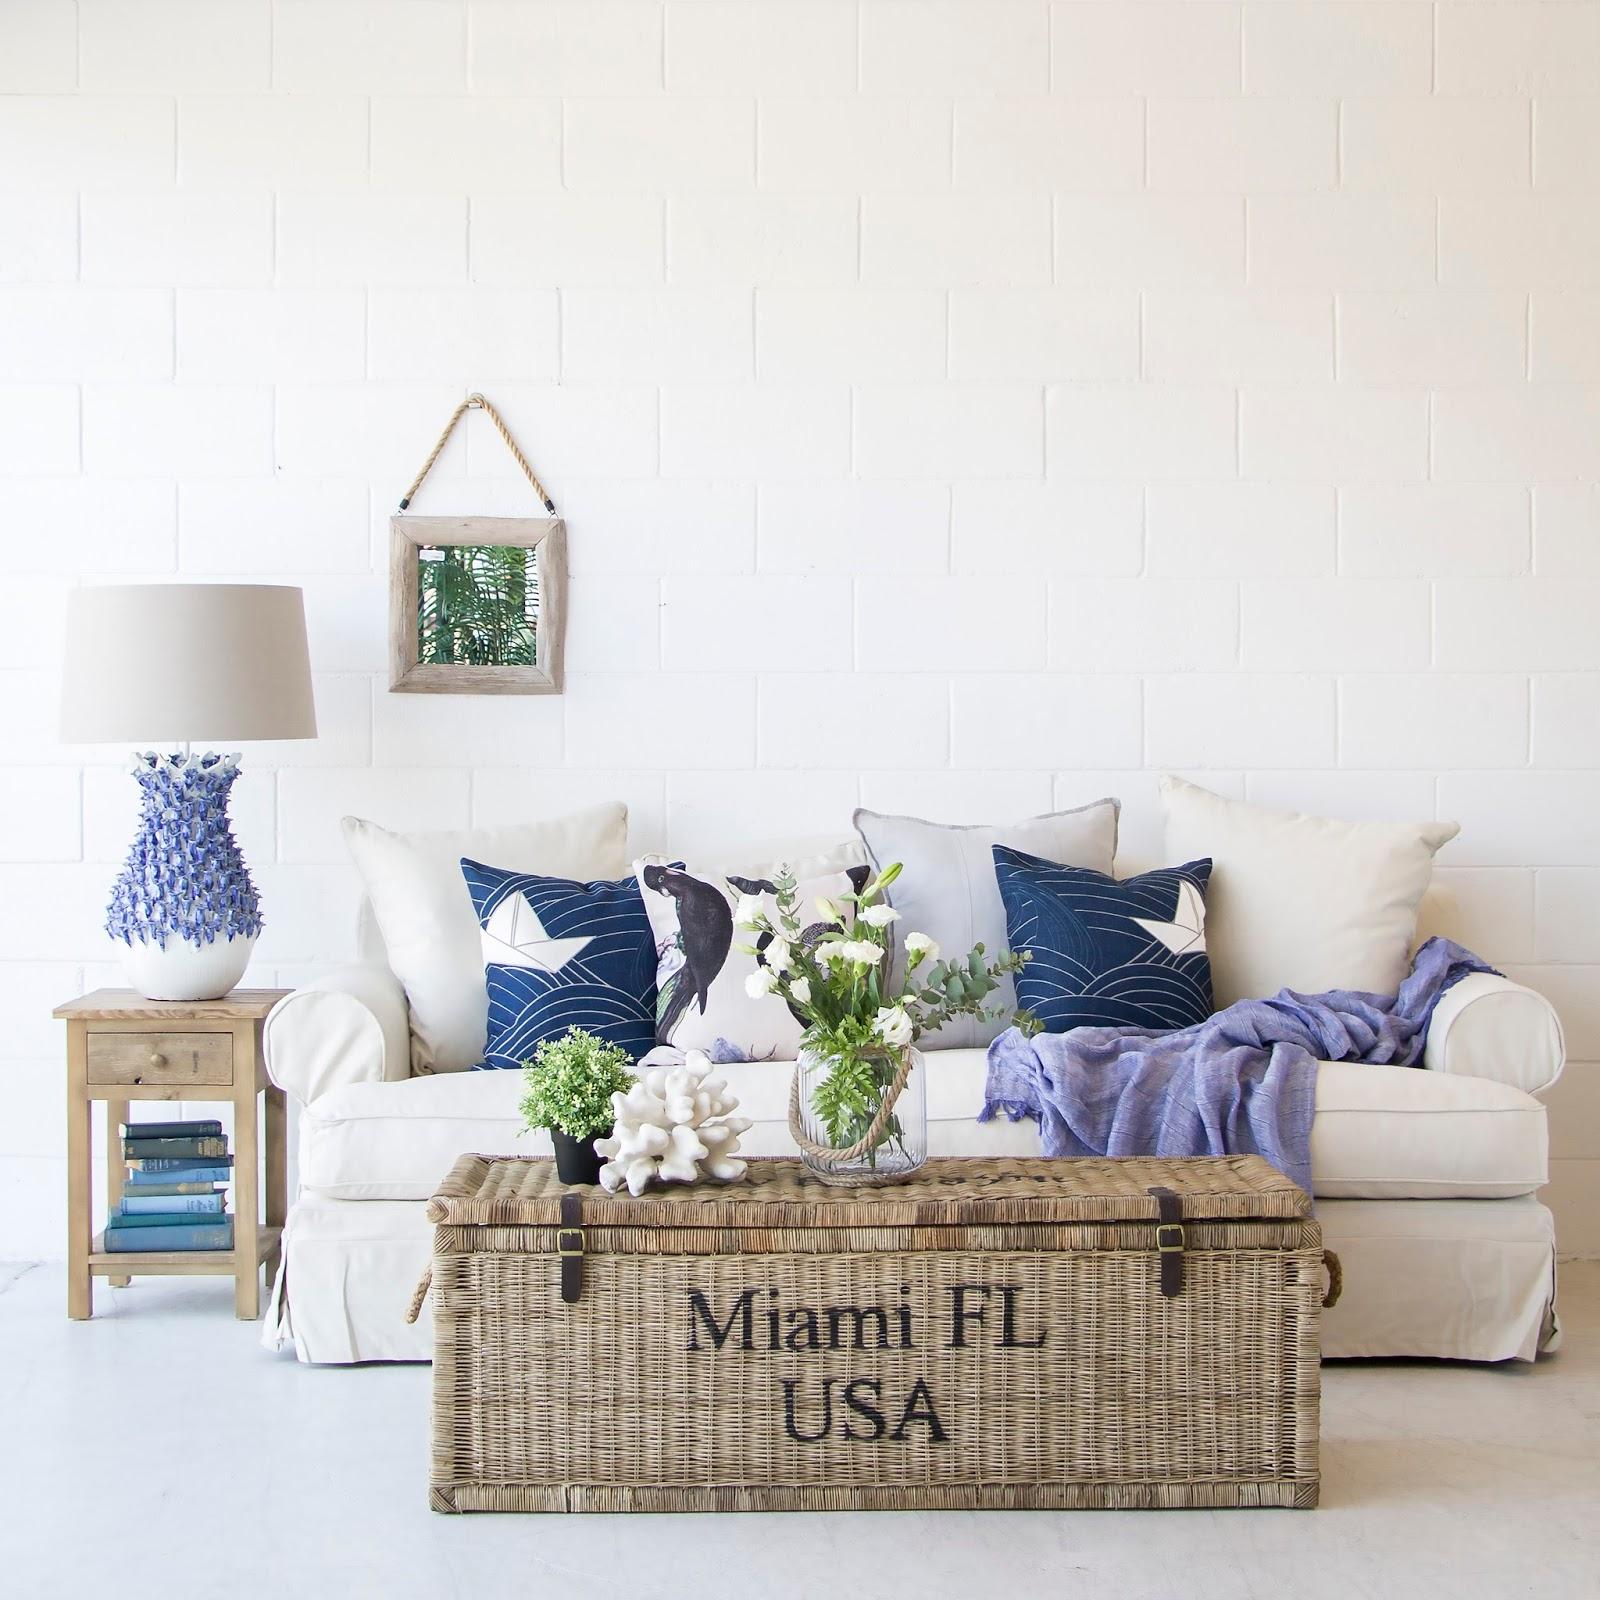 House Style Furniture : Coastal style beach house furniture